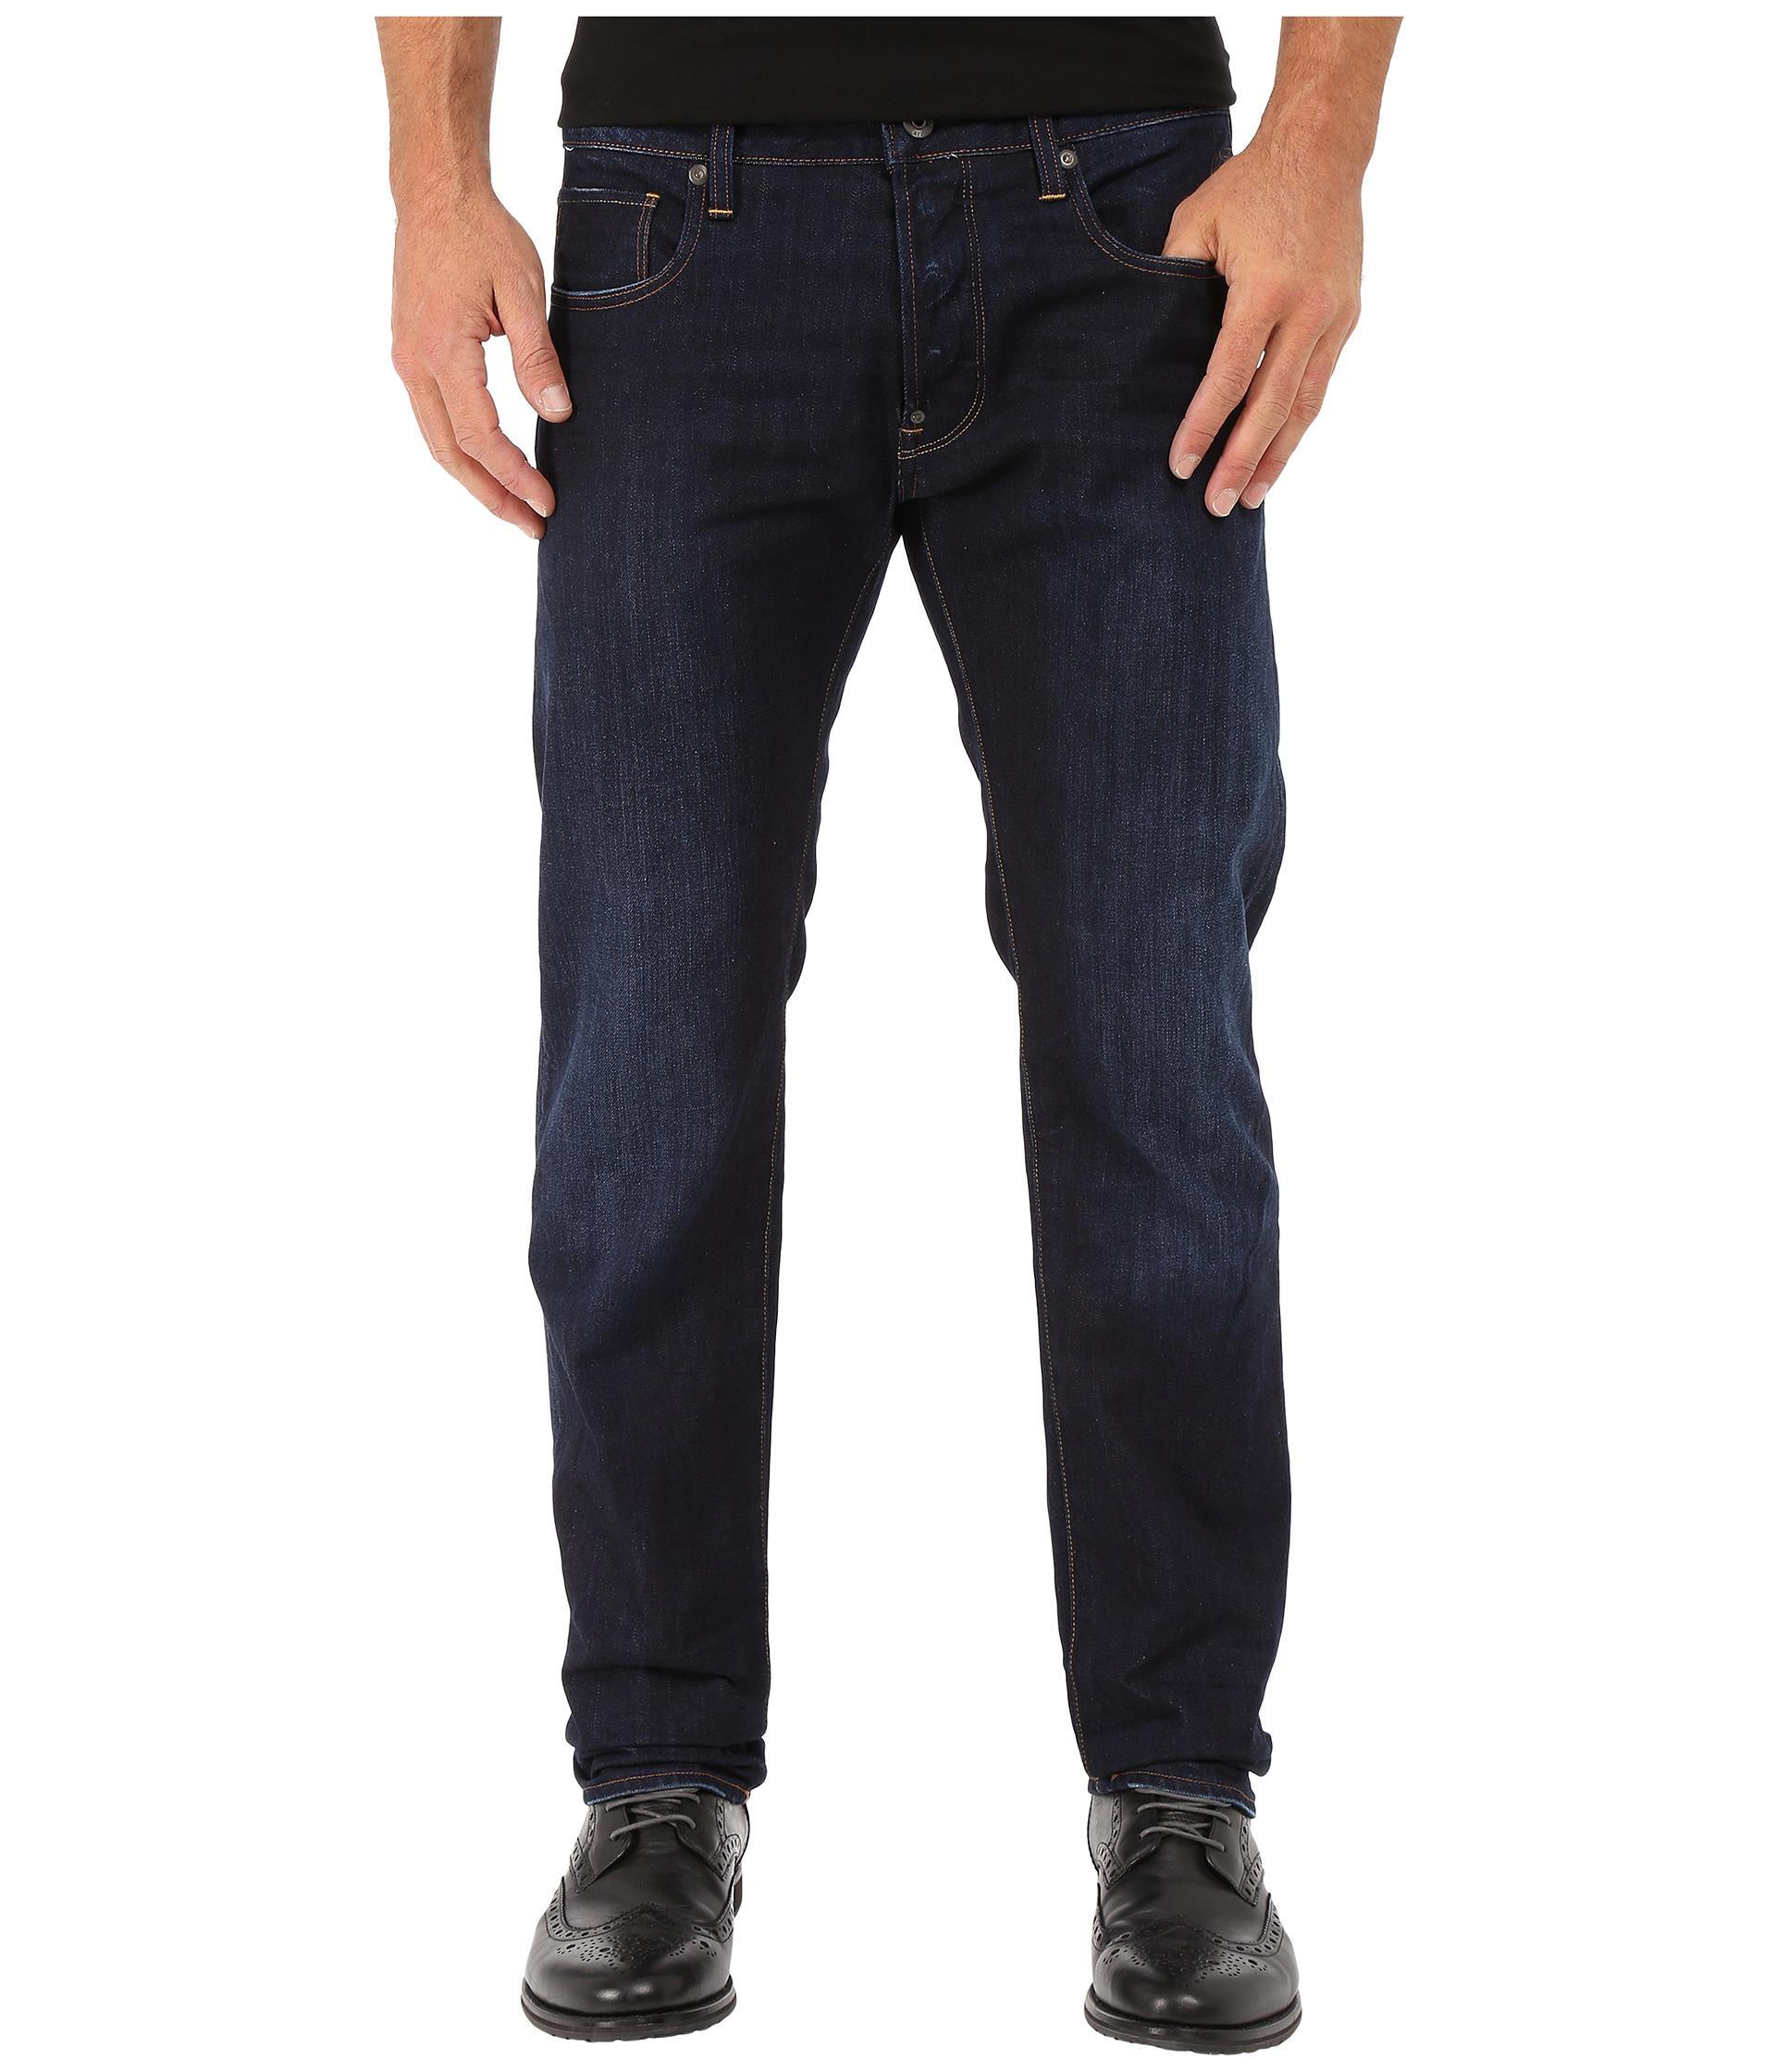 39f7b54d1d8 G-Star RAW Attacc Slim Straight Jeans In Hadron Denim Dark Aged in ...